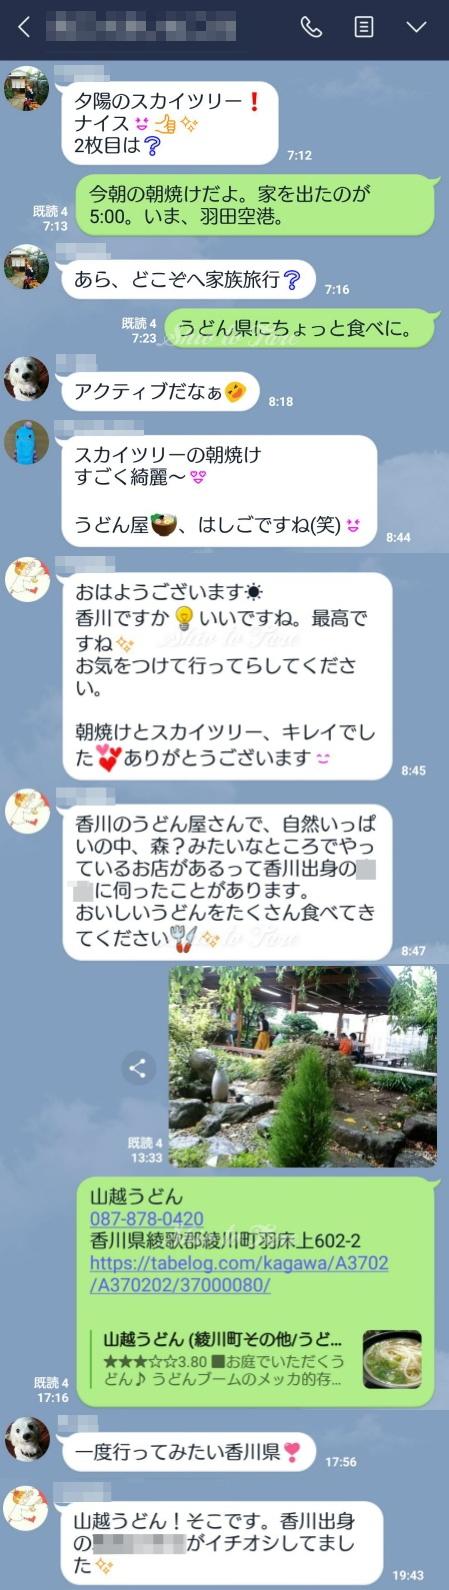 DSC_0019b_20190806_01_山越うどん(minamisan)